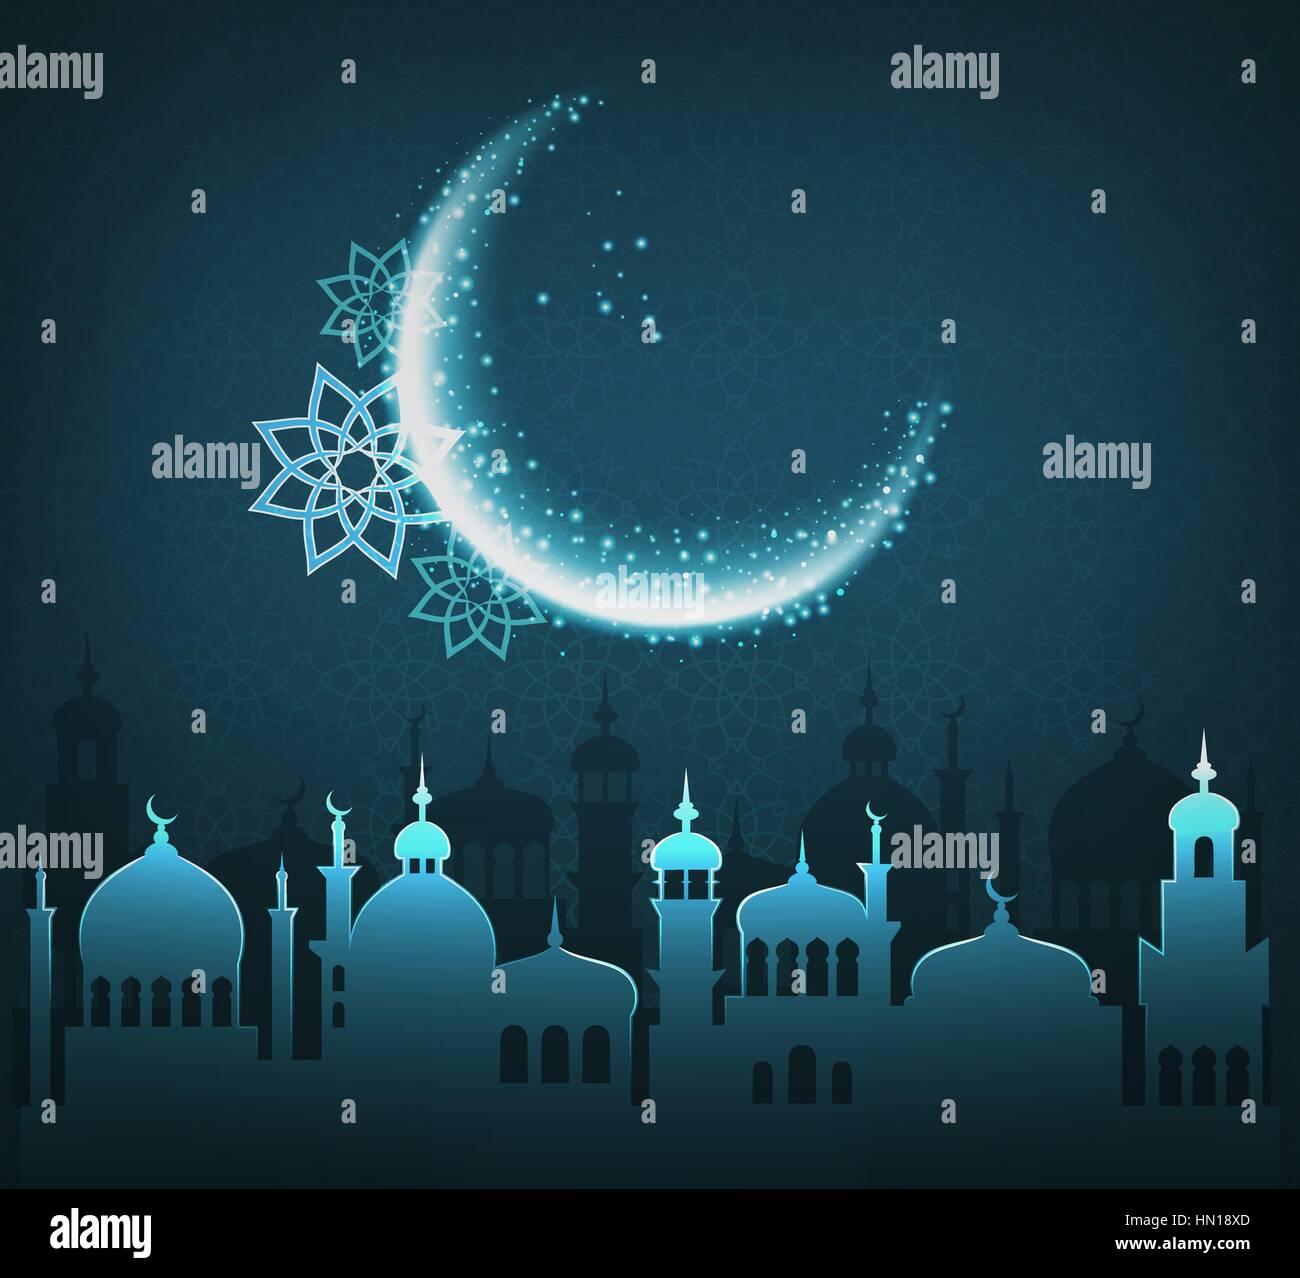 Muslim holiday ramadan kareem generous month greet card in blue muslim holiday ramadan kareem generous month greet card in blue m4hsunfo